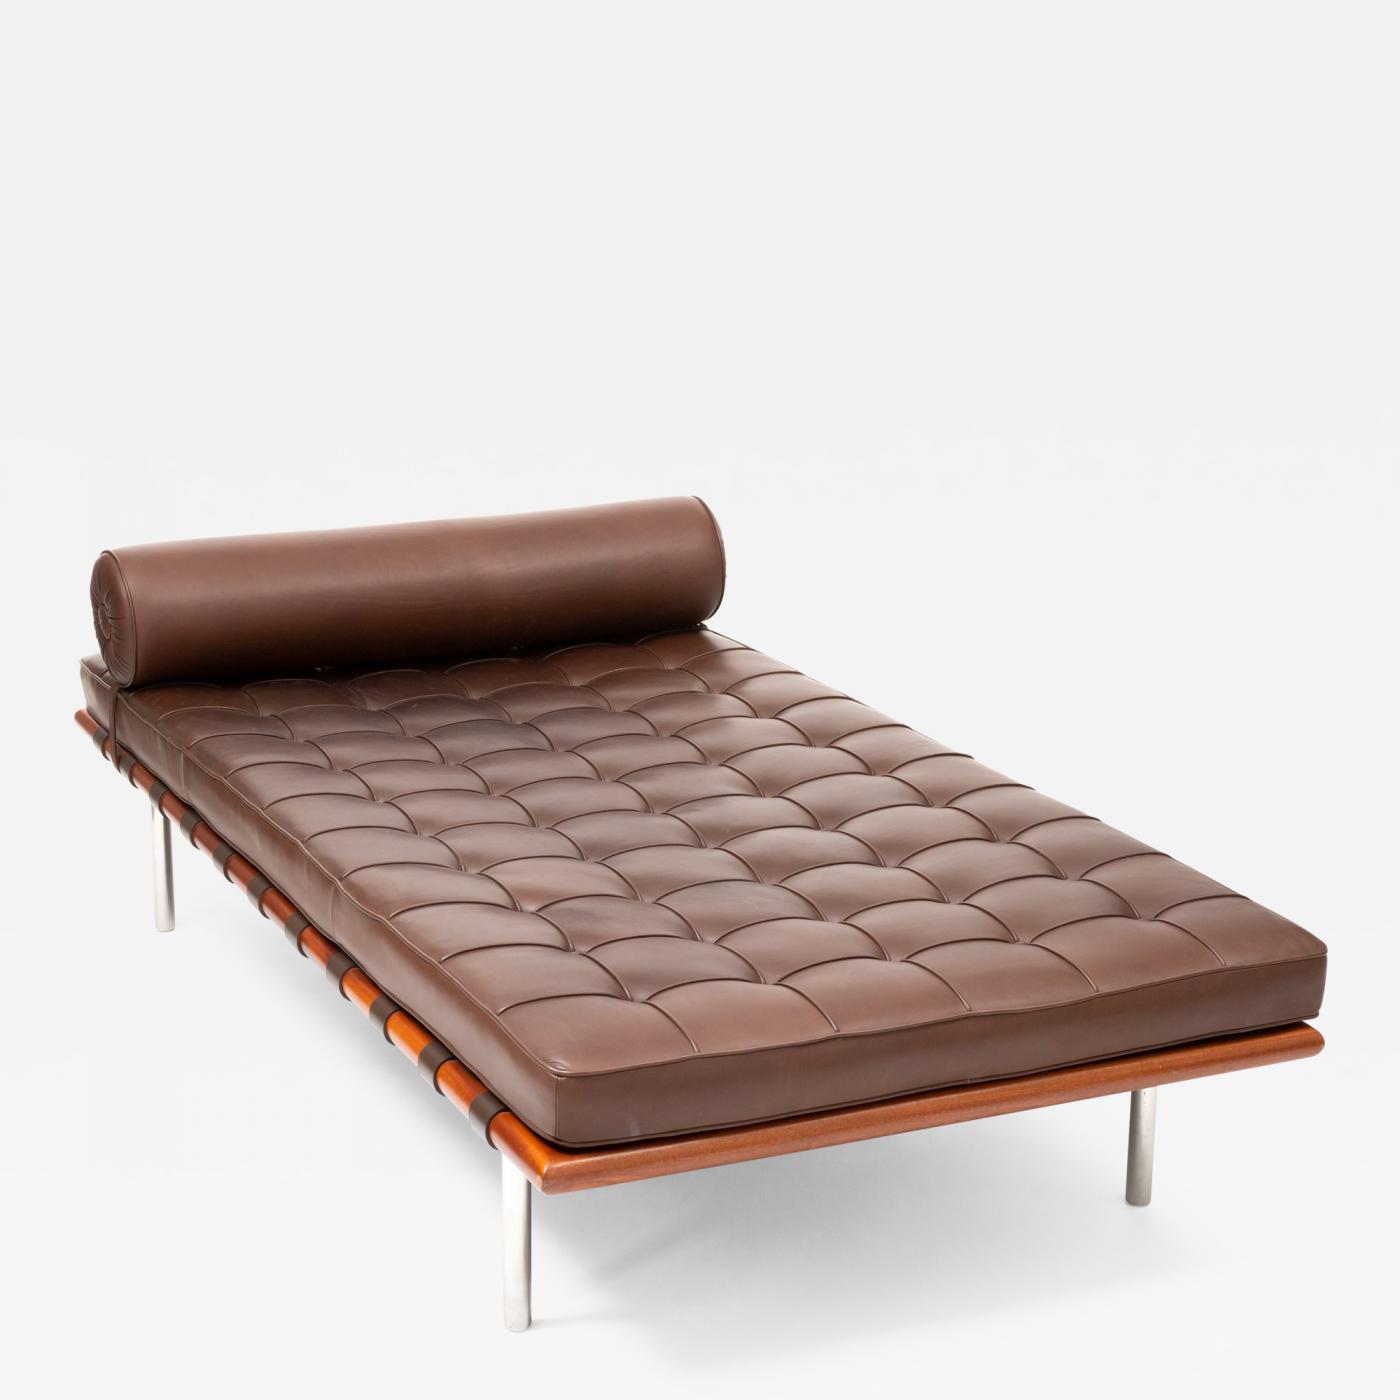 ludwig mies van der rohe barcelona chaise couch in brown leather by ludwig mies van der rohe